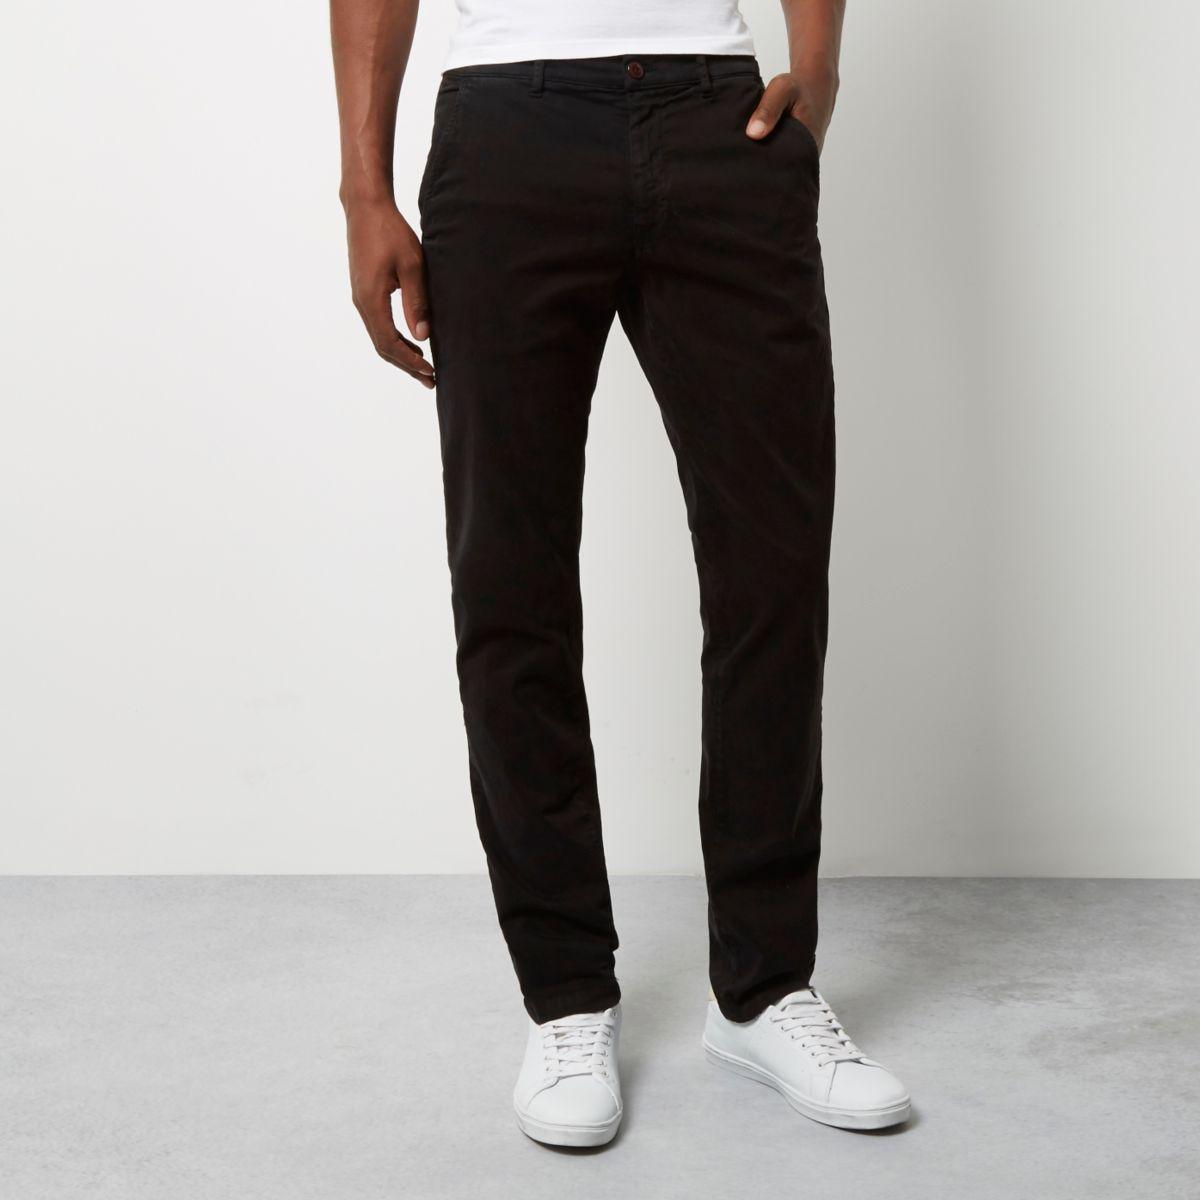 Black Franklin & Marshall skinny trousers